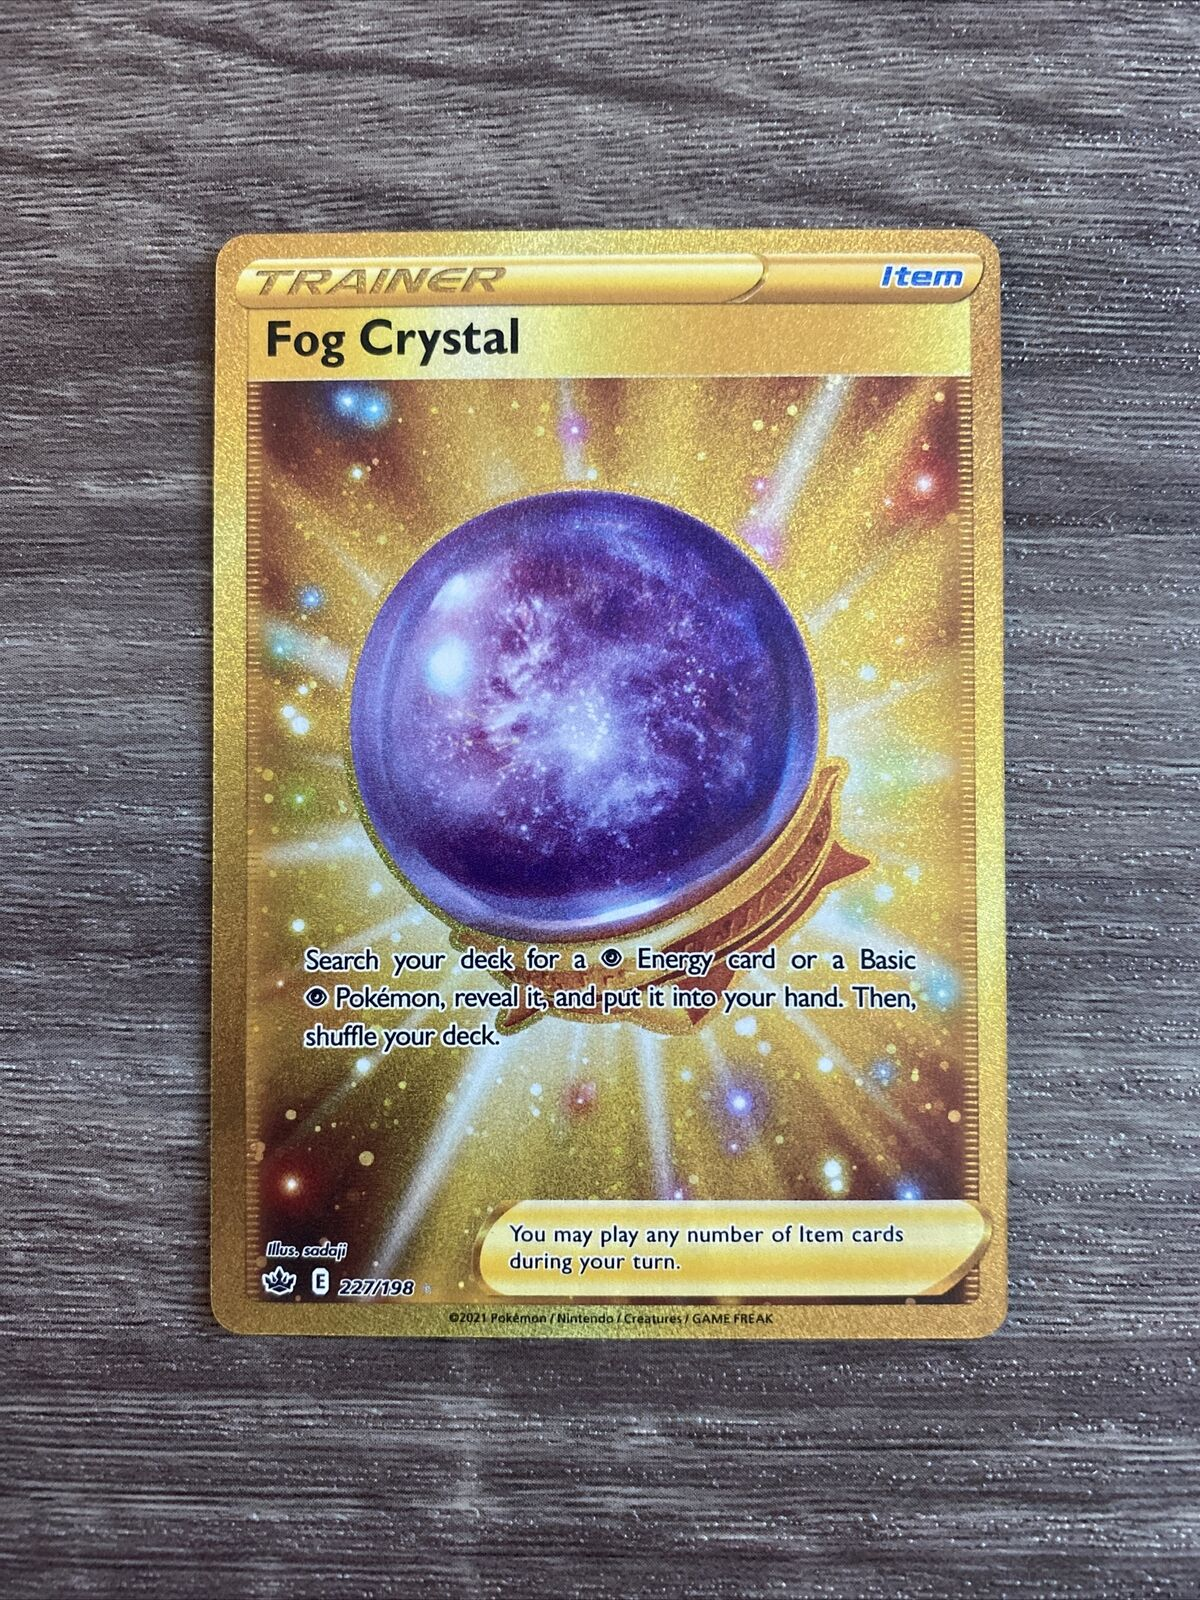 Fog Crystal Pokémon Gold Secret Rare Trainer Card 227/198 Chilling Reign Mint